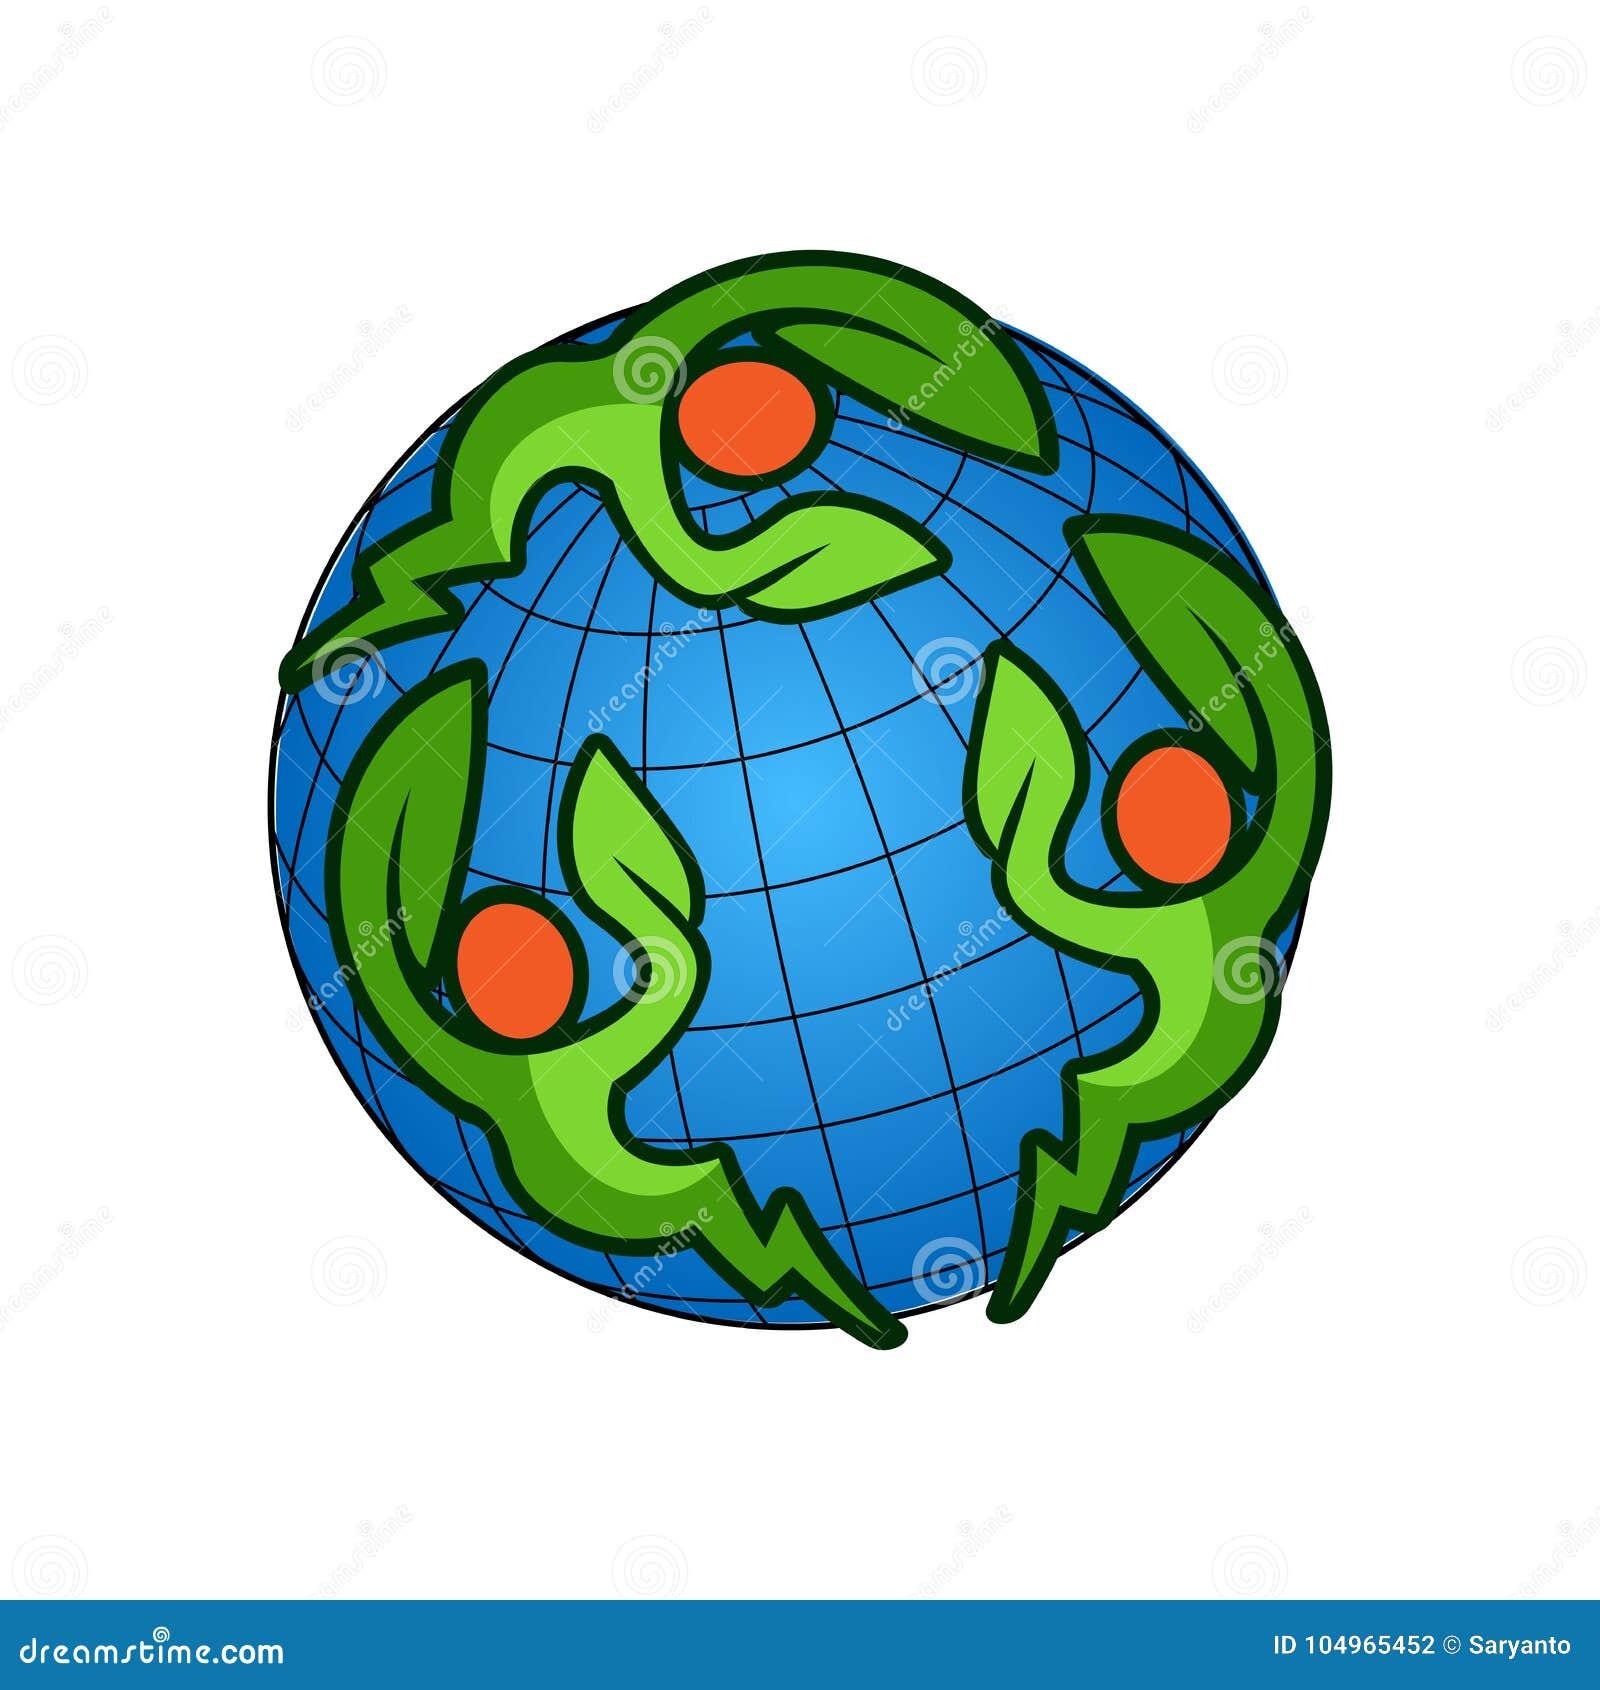 Go green symbols image collections symbol and sign ideas human leaf with electric symbols logo leaves go green people human leaf with electric symbols logo buycottarizona